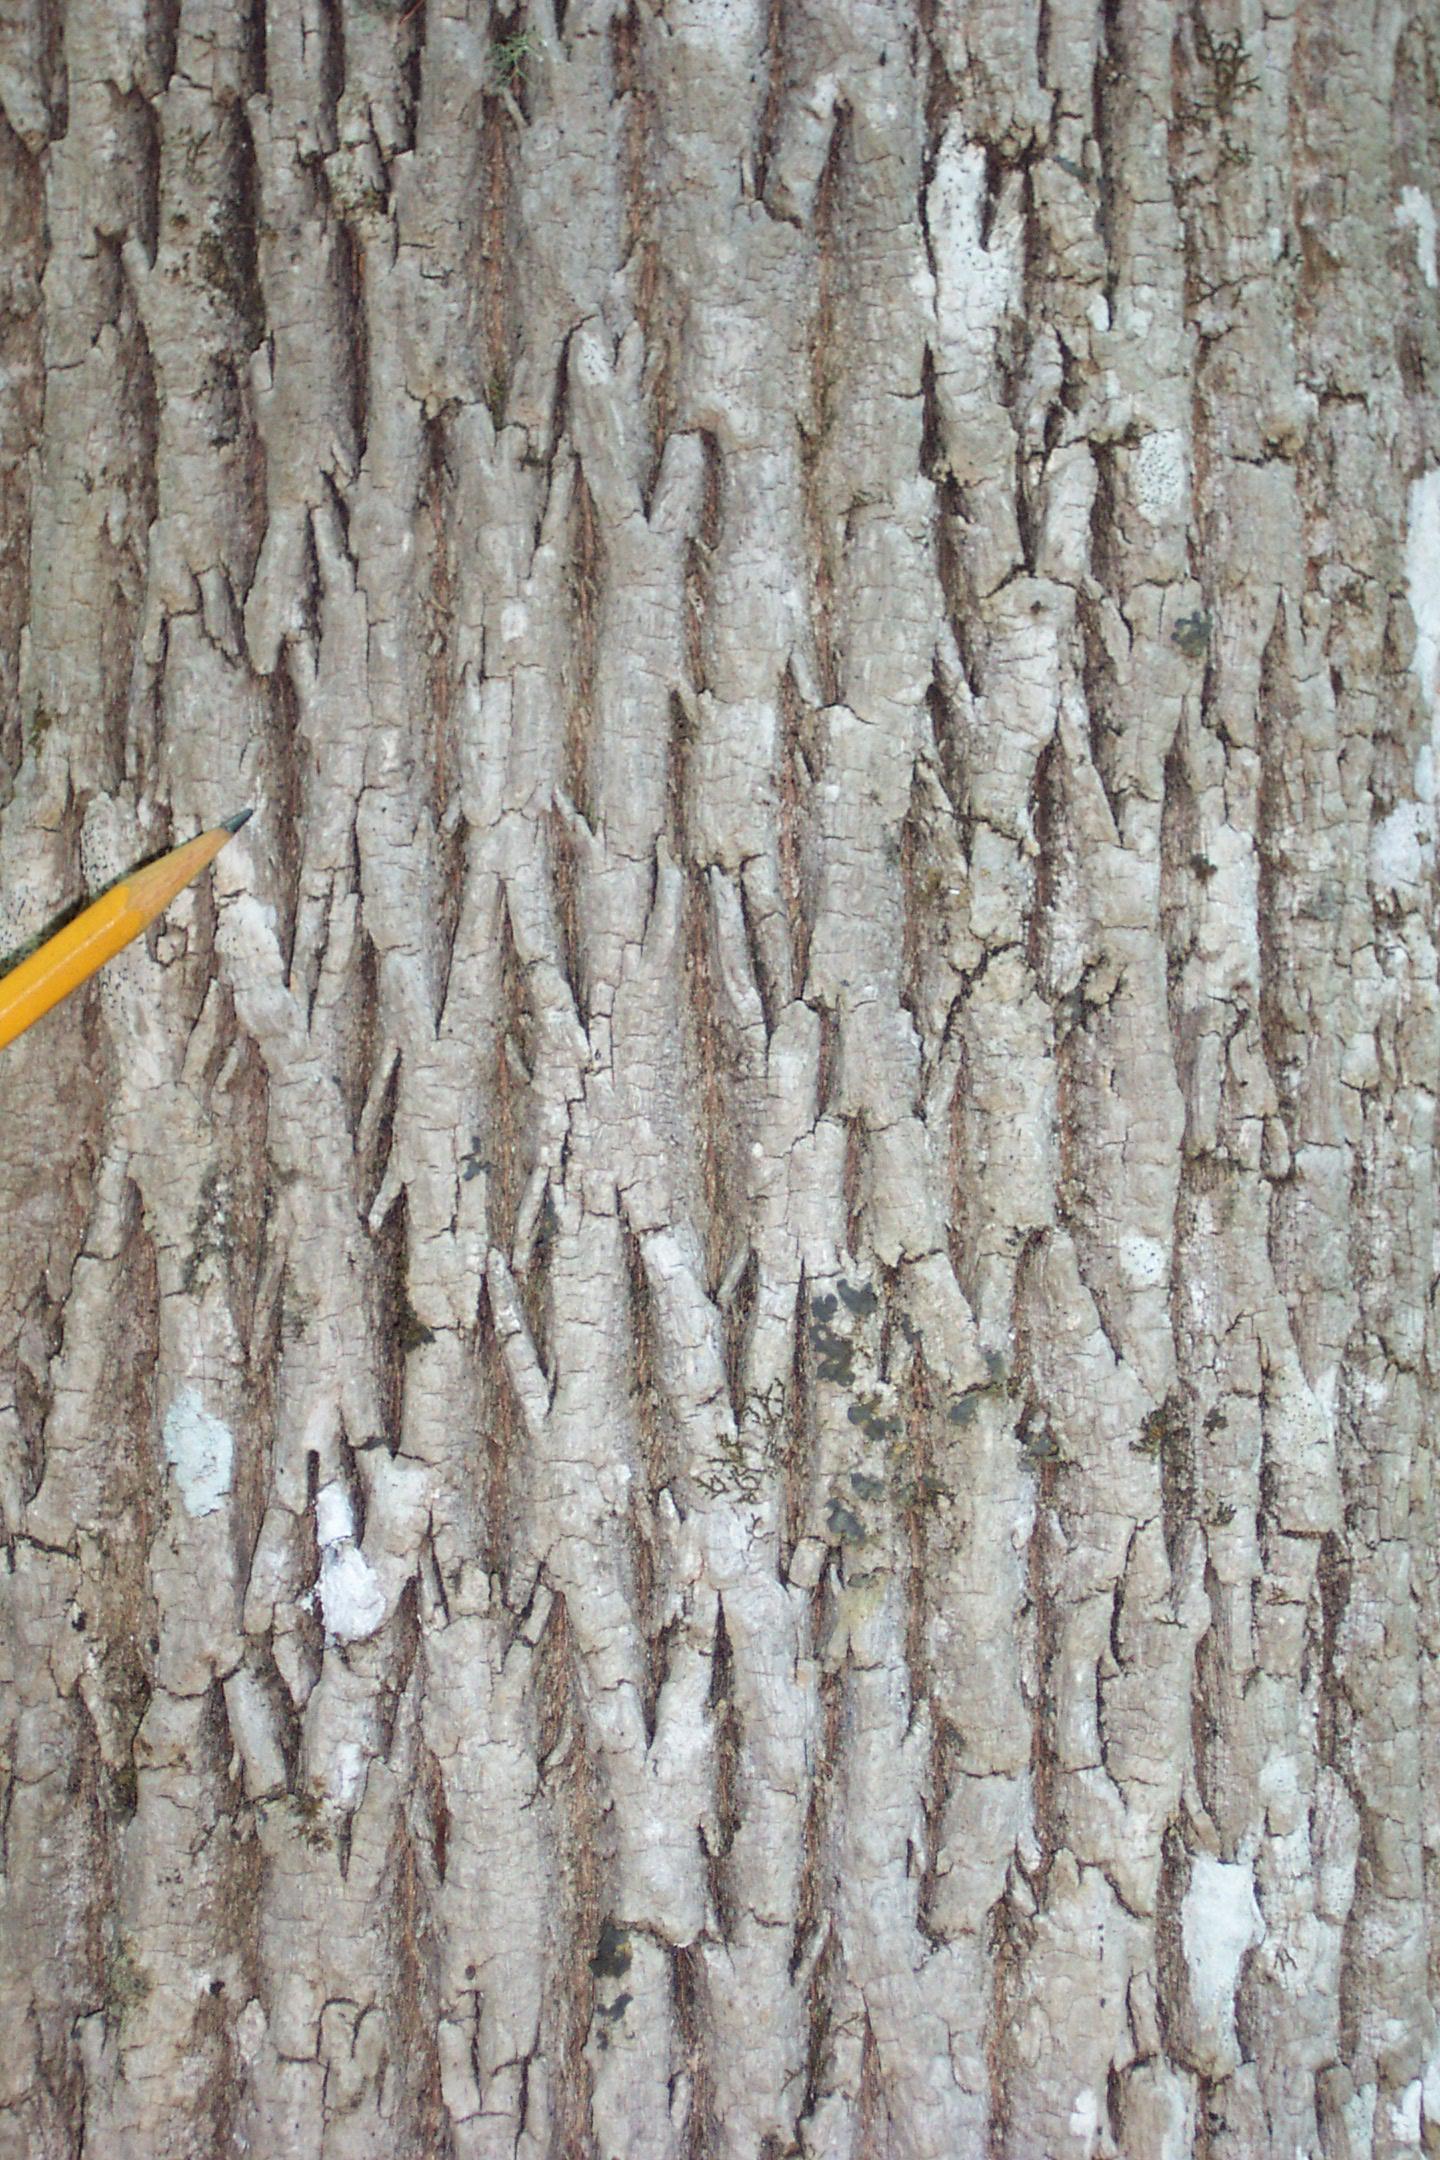 ash-bark.jpg